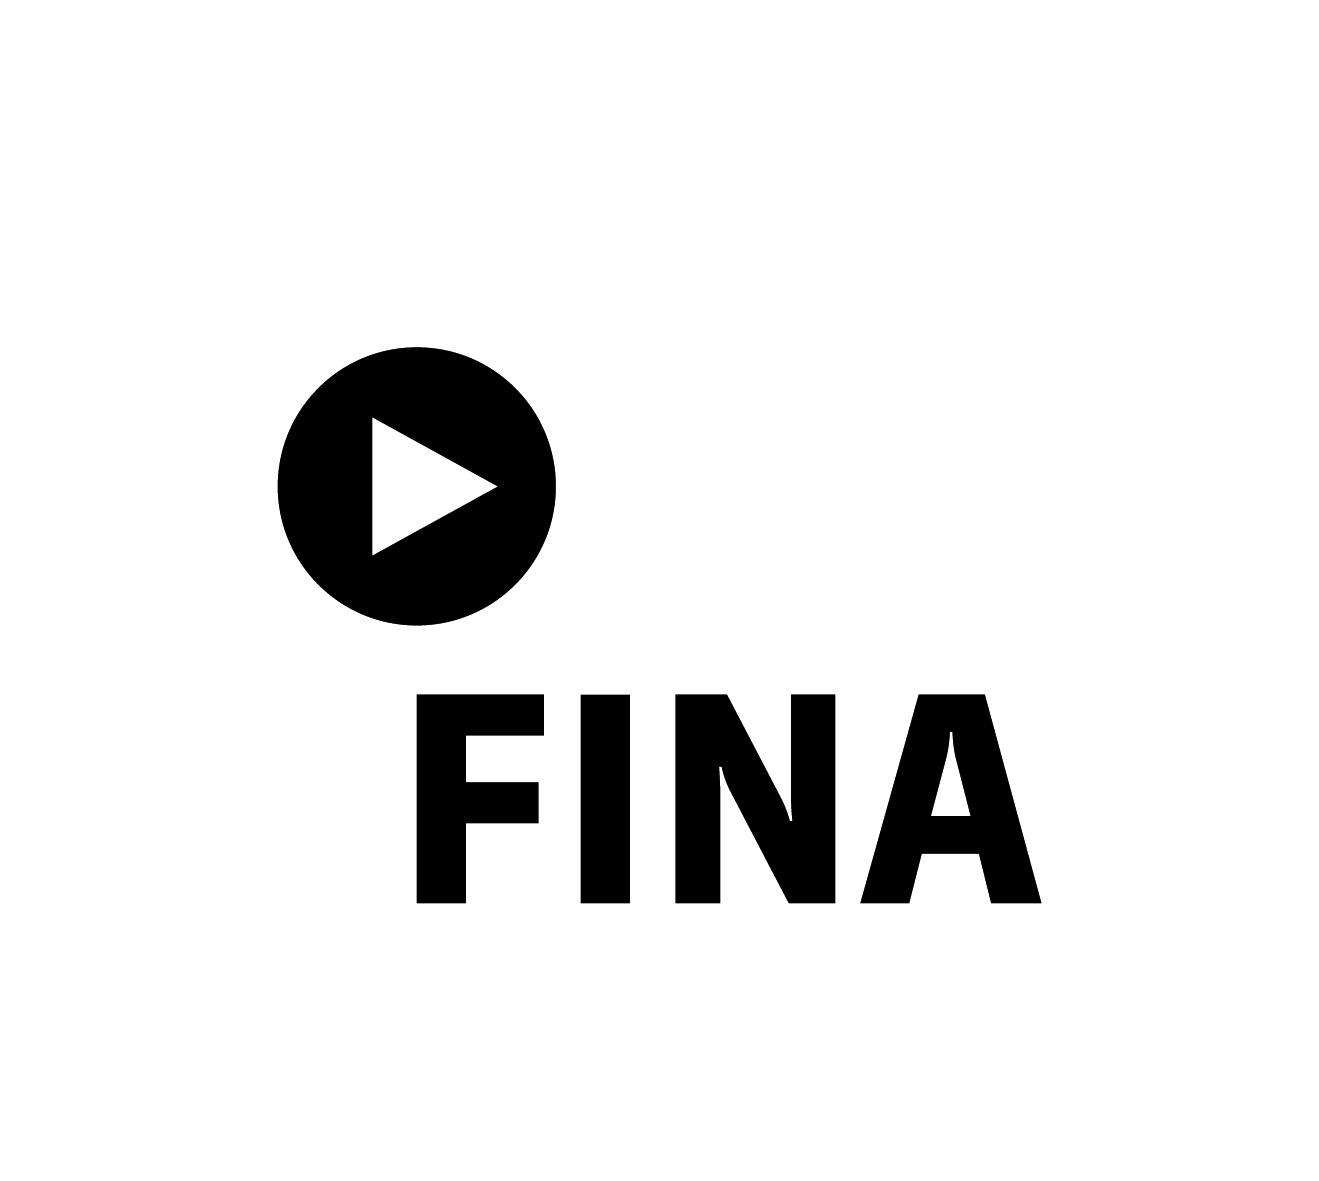 Polish National Film Archive